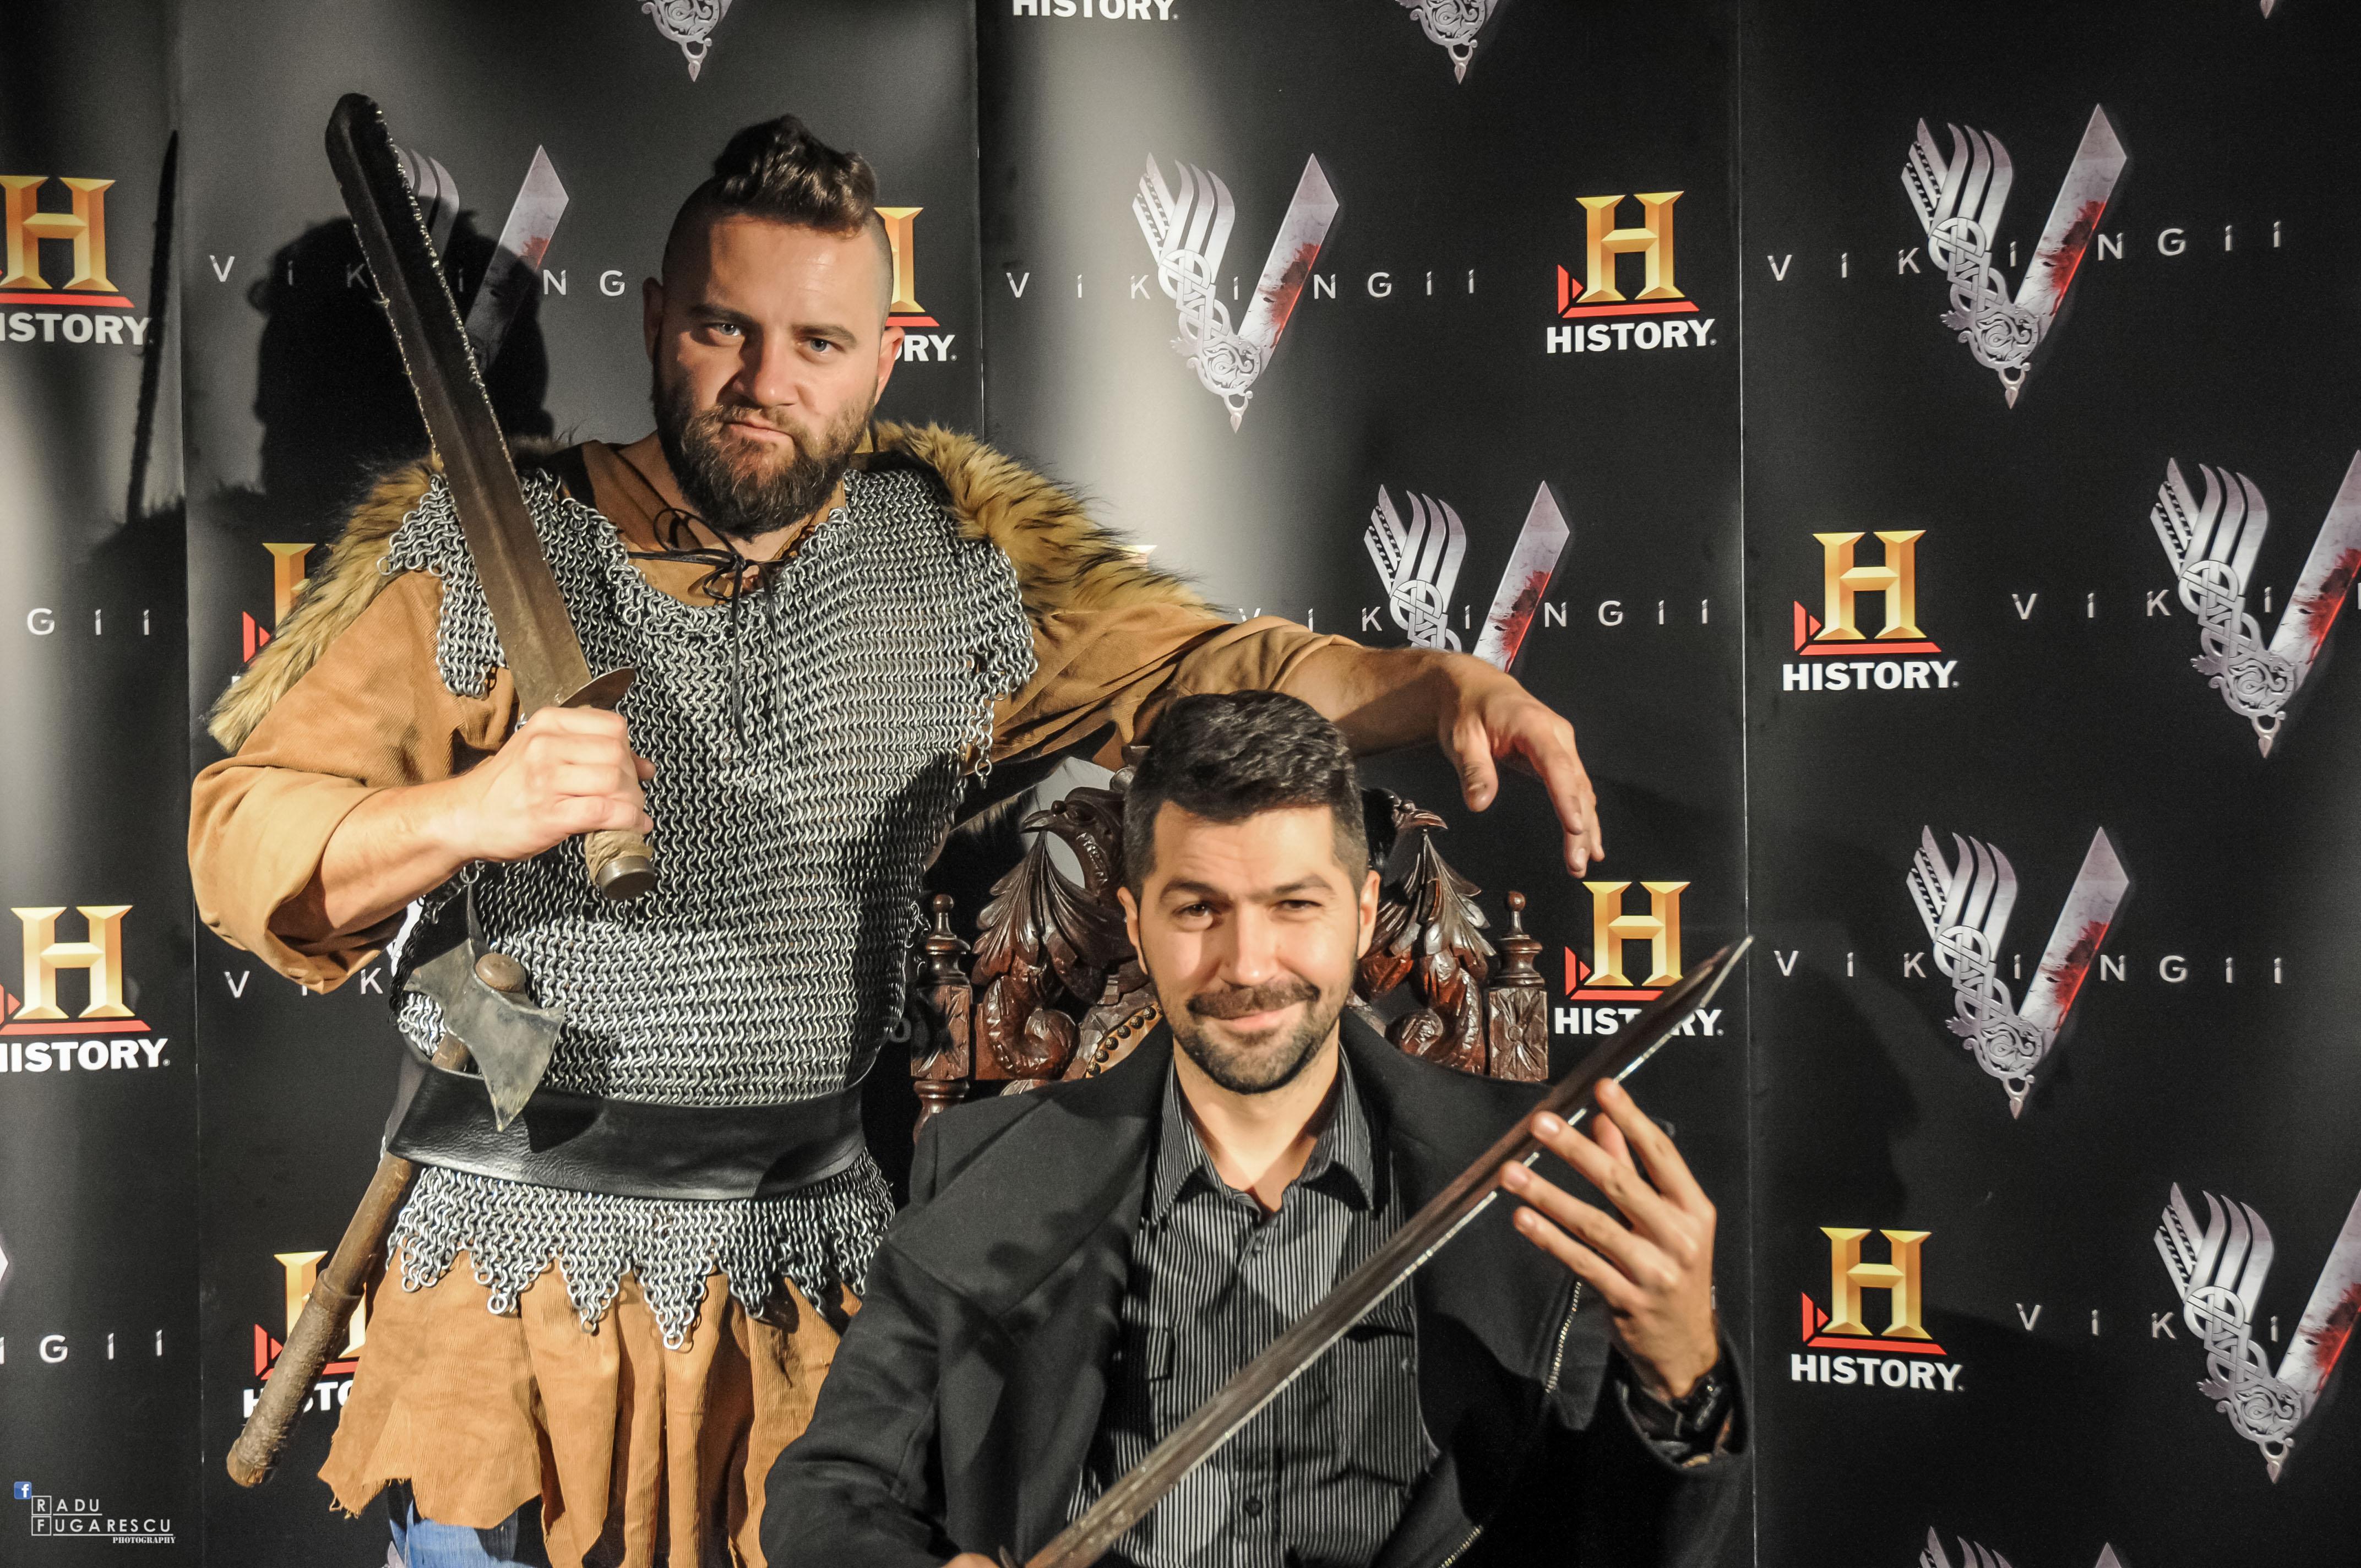 Maga&Ragnar